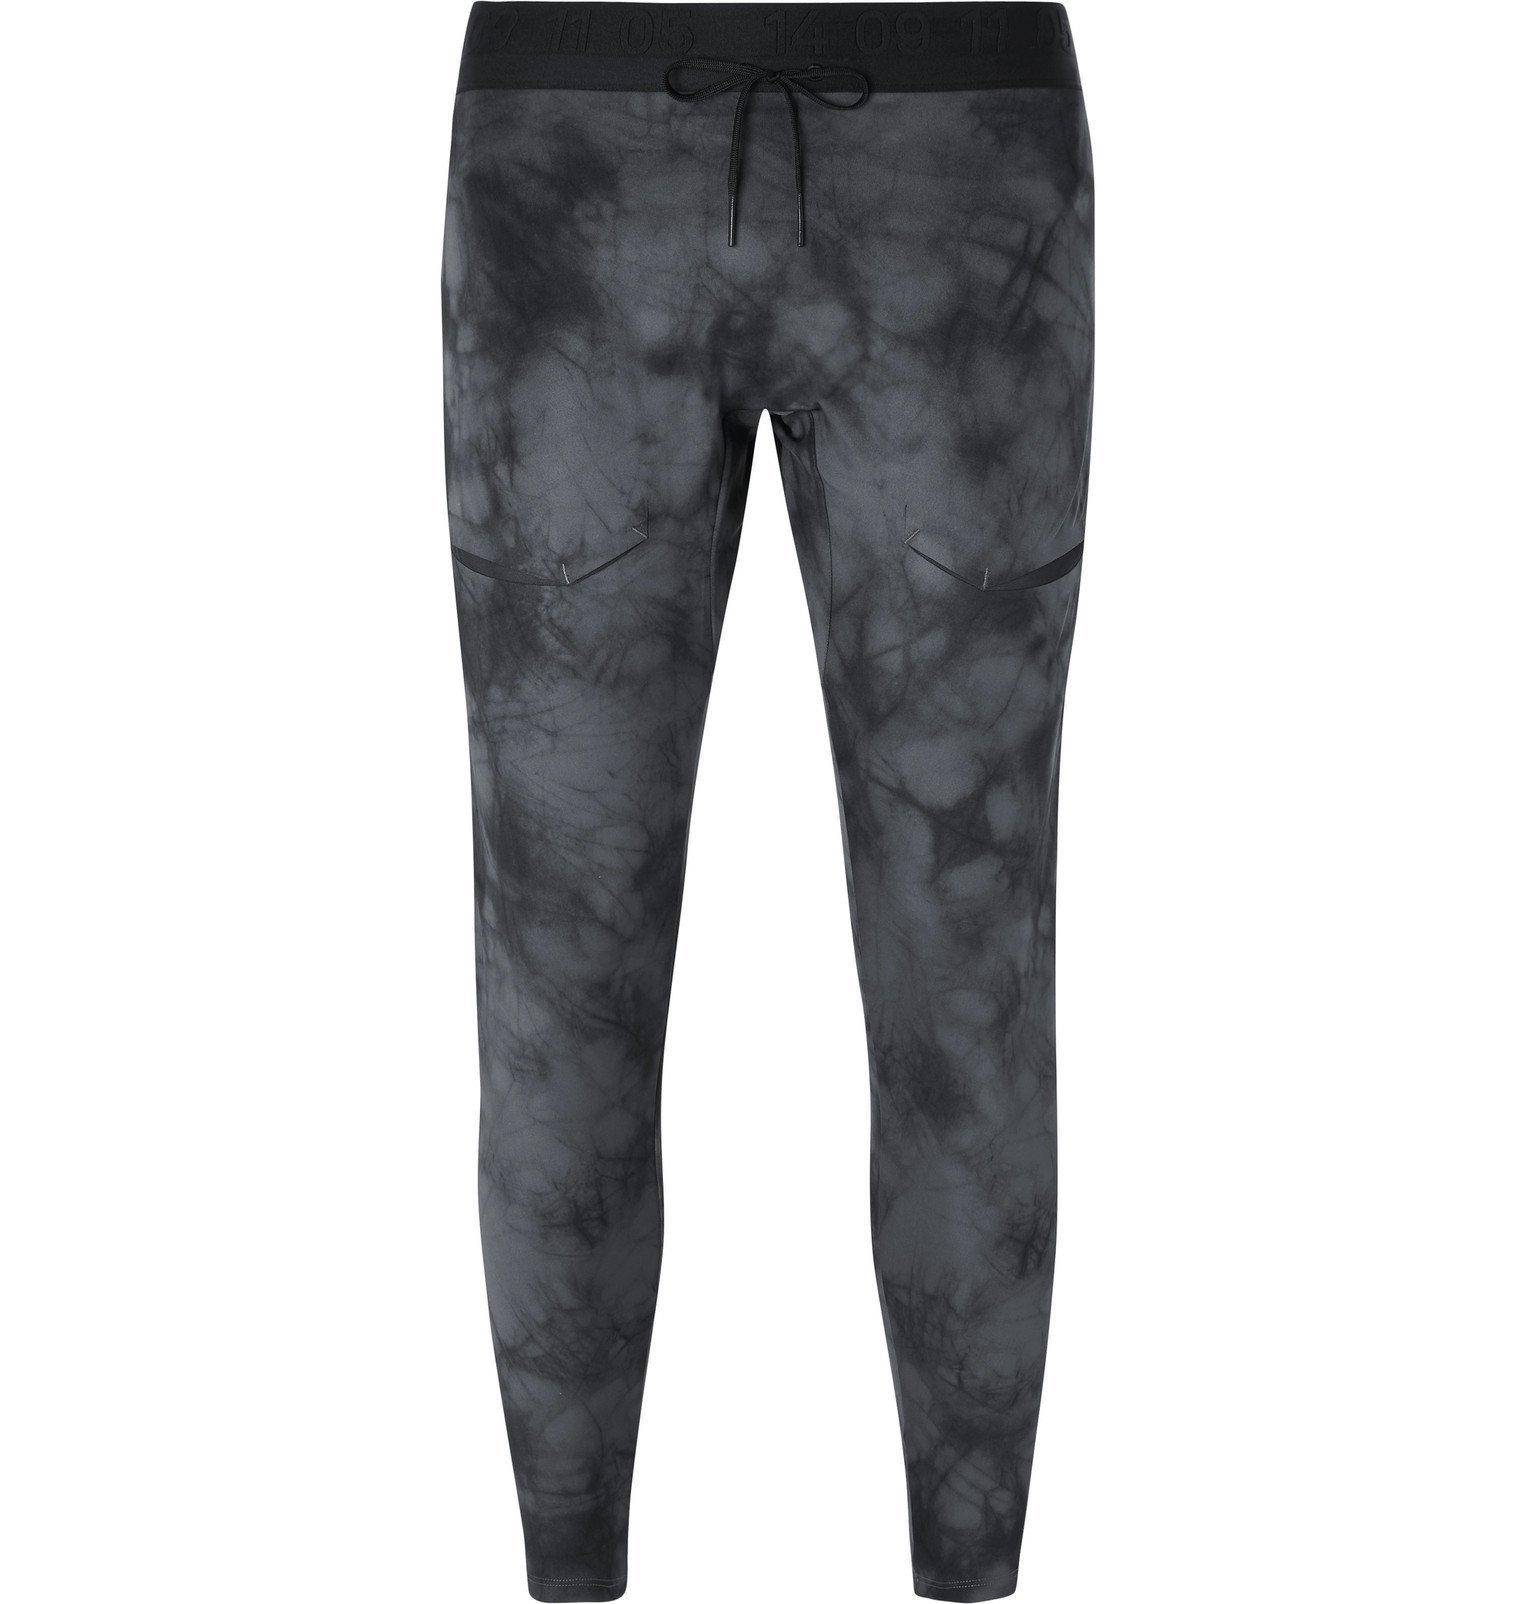 Nike Running - Power Printed Stretch-Jersey Running Tights - Gray